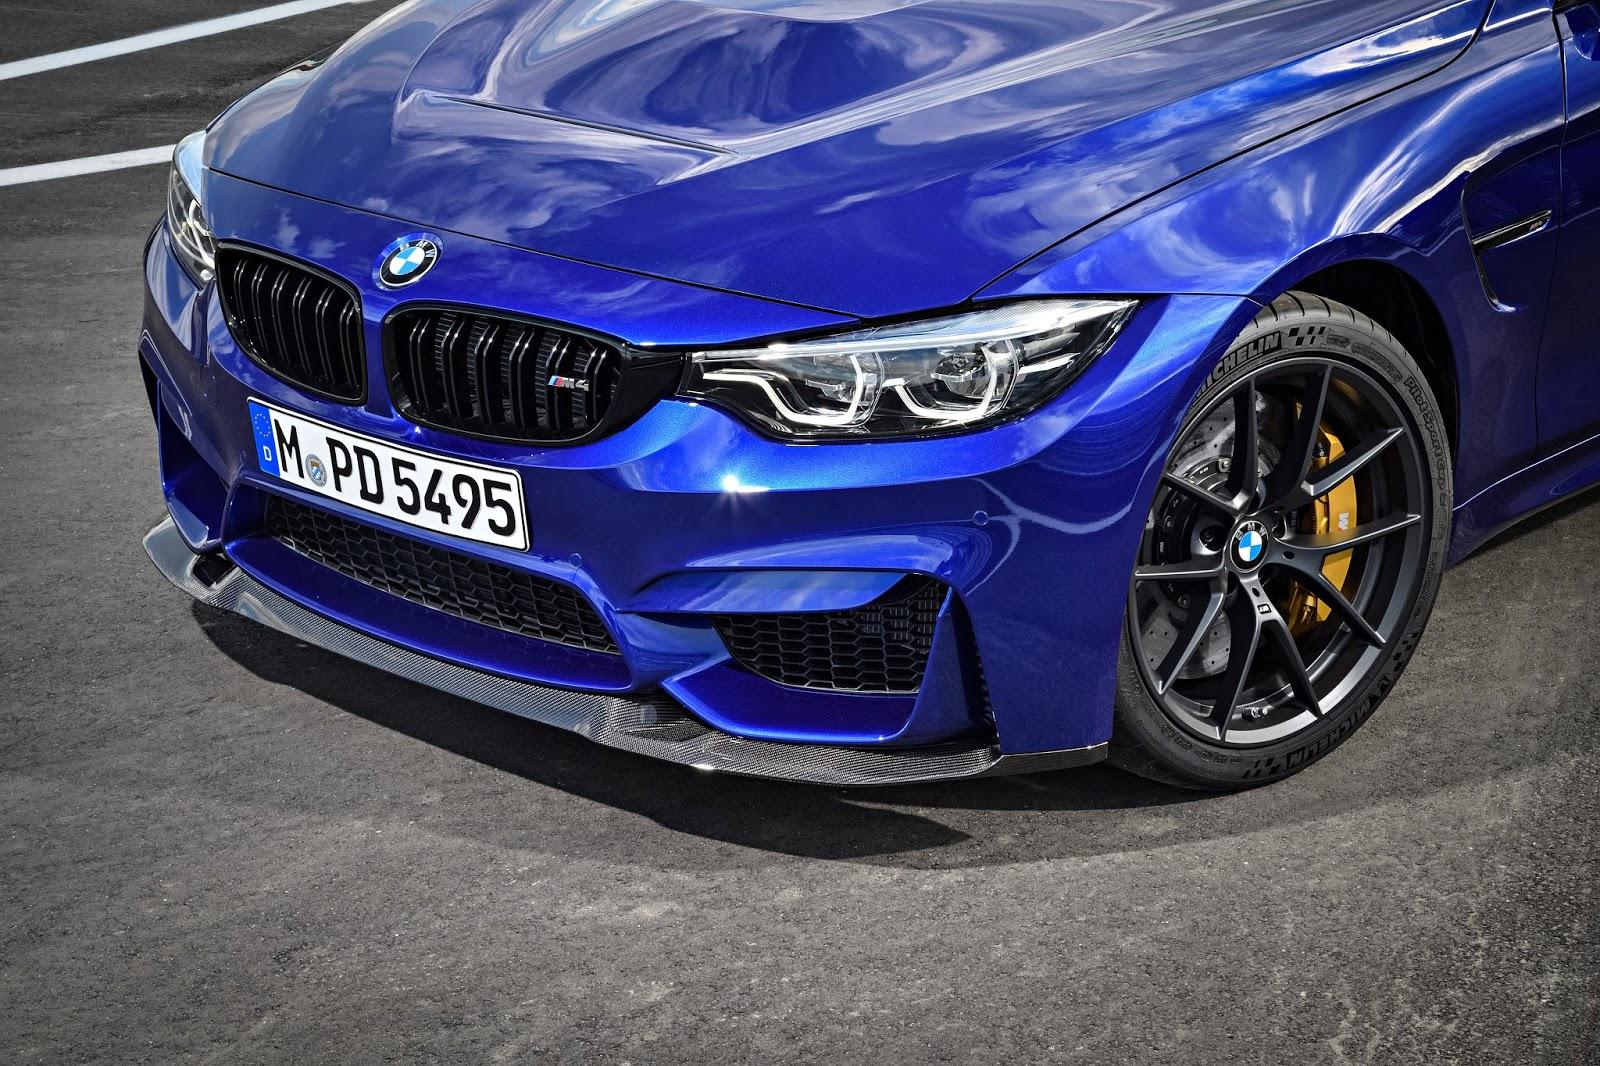 P90251050 highRes the new bmw m4 cs 04 Η περιορισμένης παραγωγής BMW M4 ClubSport δική σας με 116.900 ευρώ BMW, BMW M, BMW M4, BMW M4 CS, BMW Motorsport, clubsport, COUPE, Limited edition, supercars, supersport, videos, Περιορισμένης παραγωγής